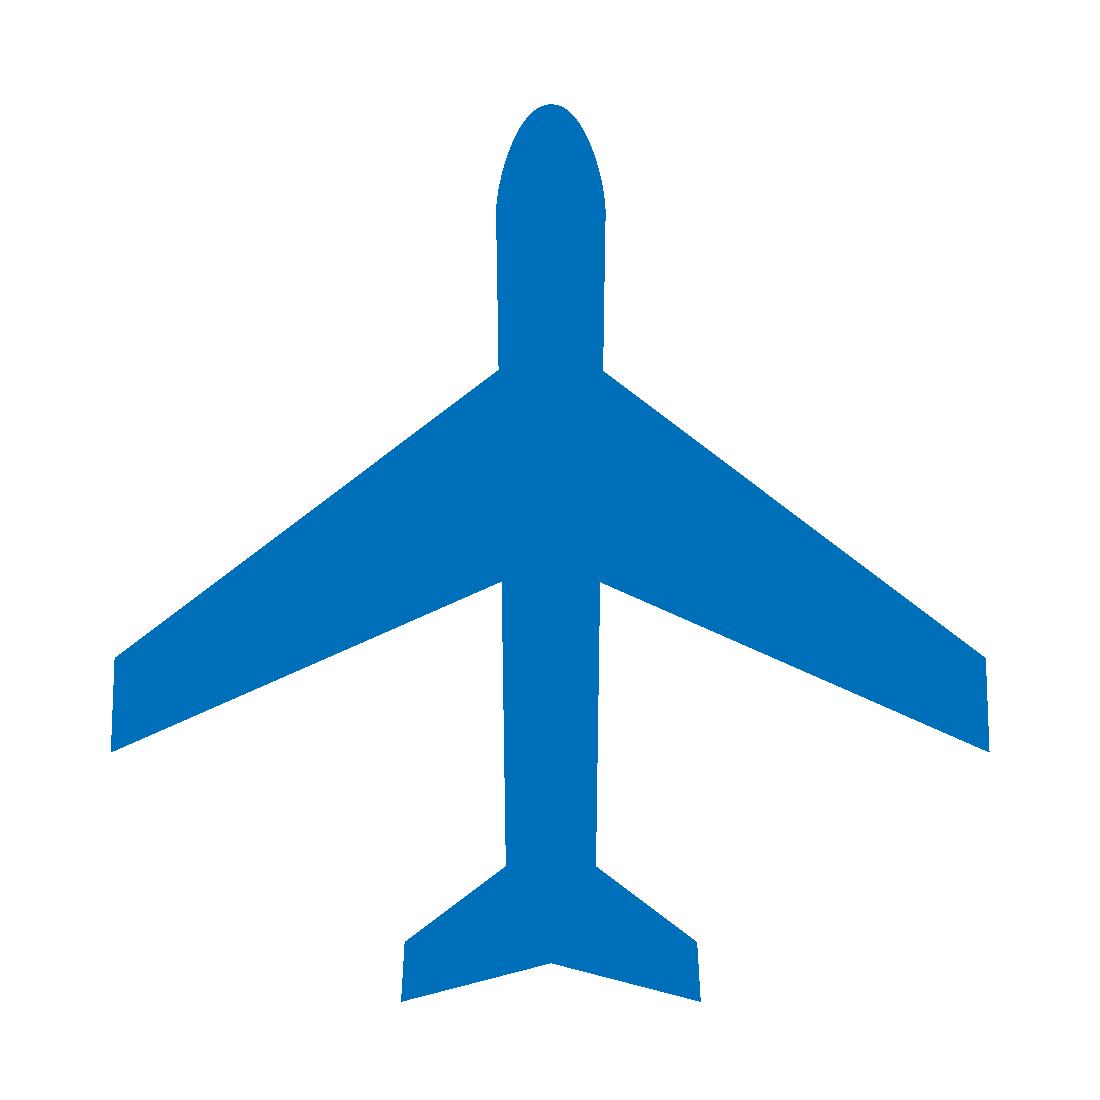 Social-Giphys_Airplane-Icon-Atlas.png